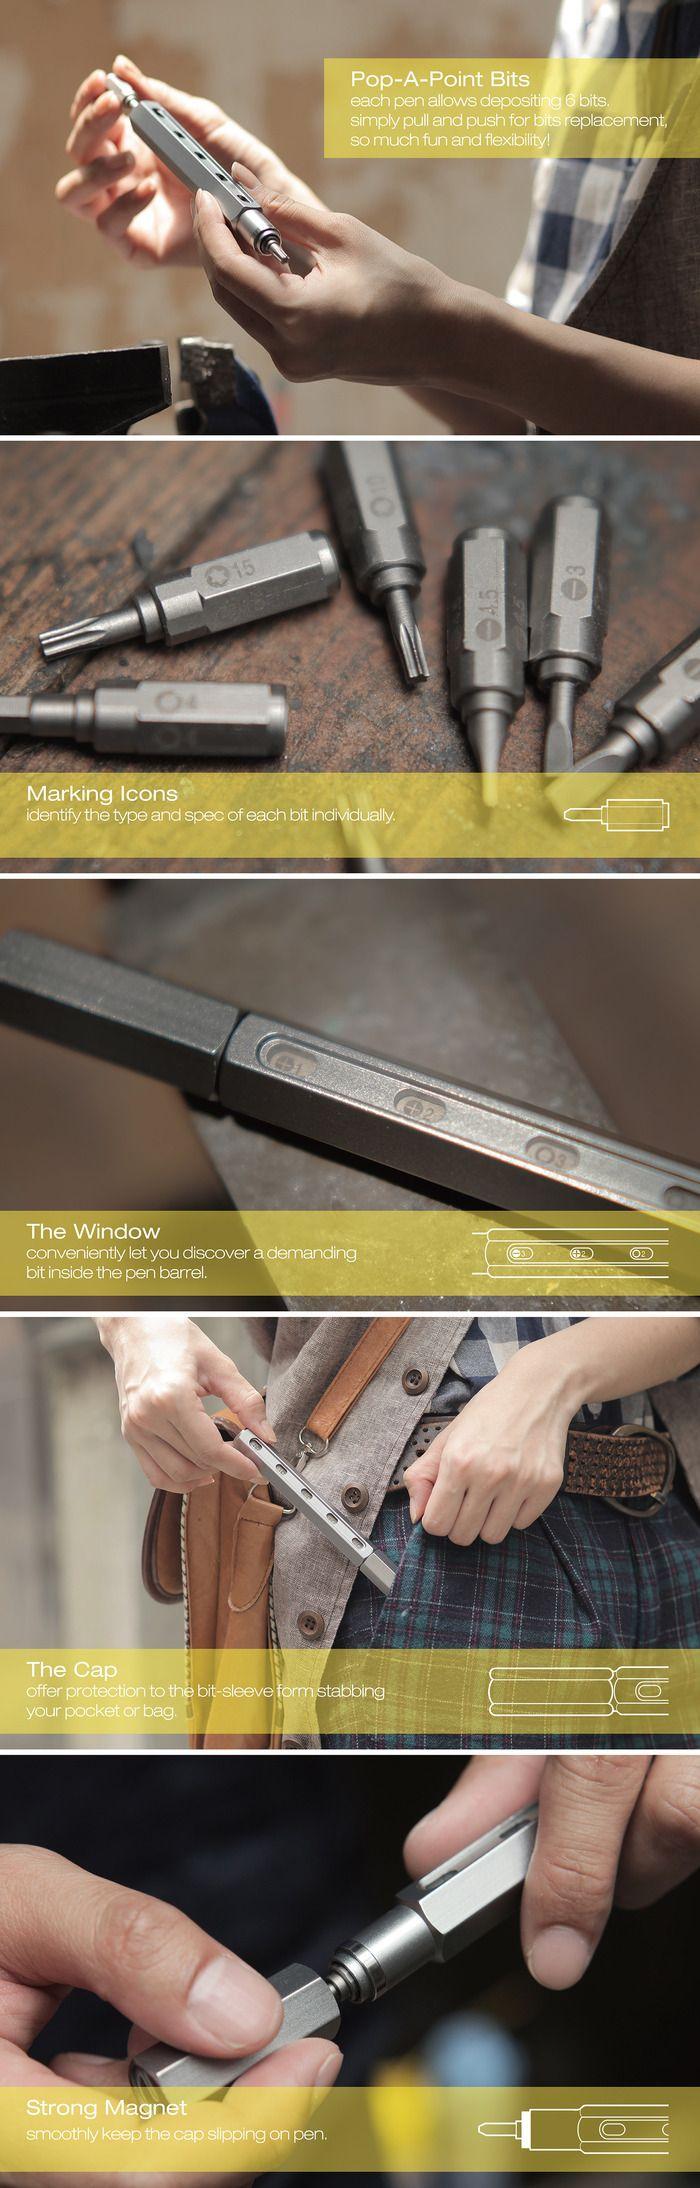 Tool Pen - Makes Everything Beautiful by mininch — Kickstarter